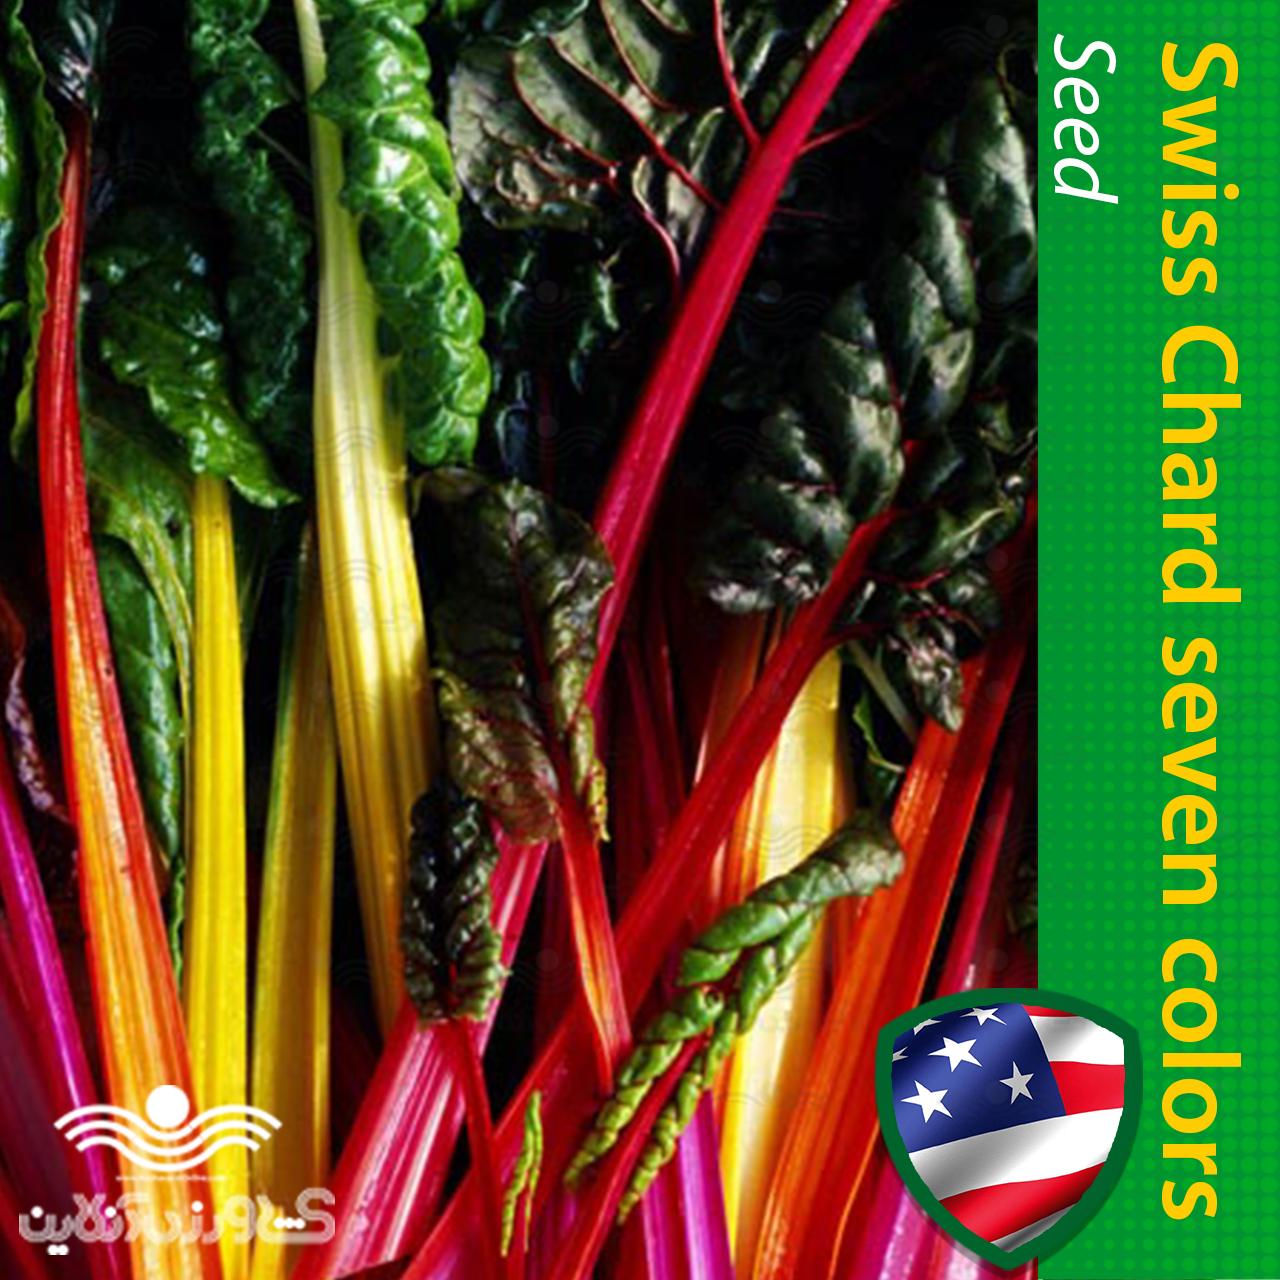 بذر برگ چغندر سوییسی